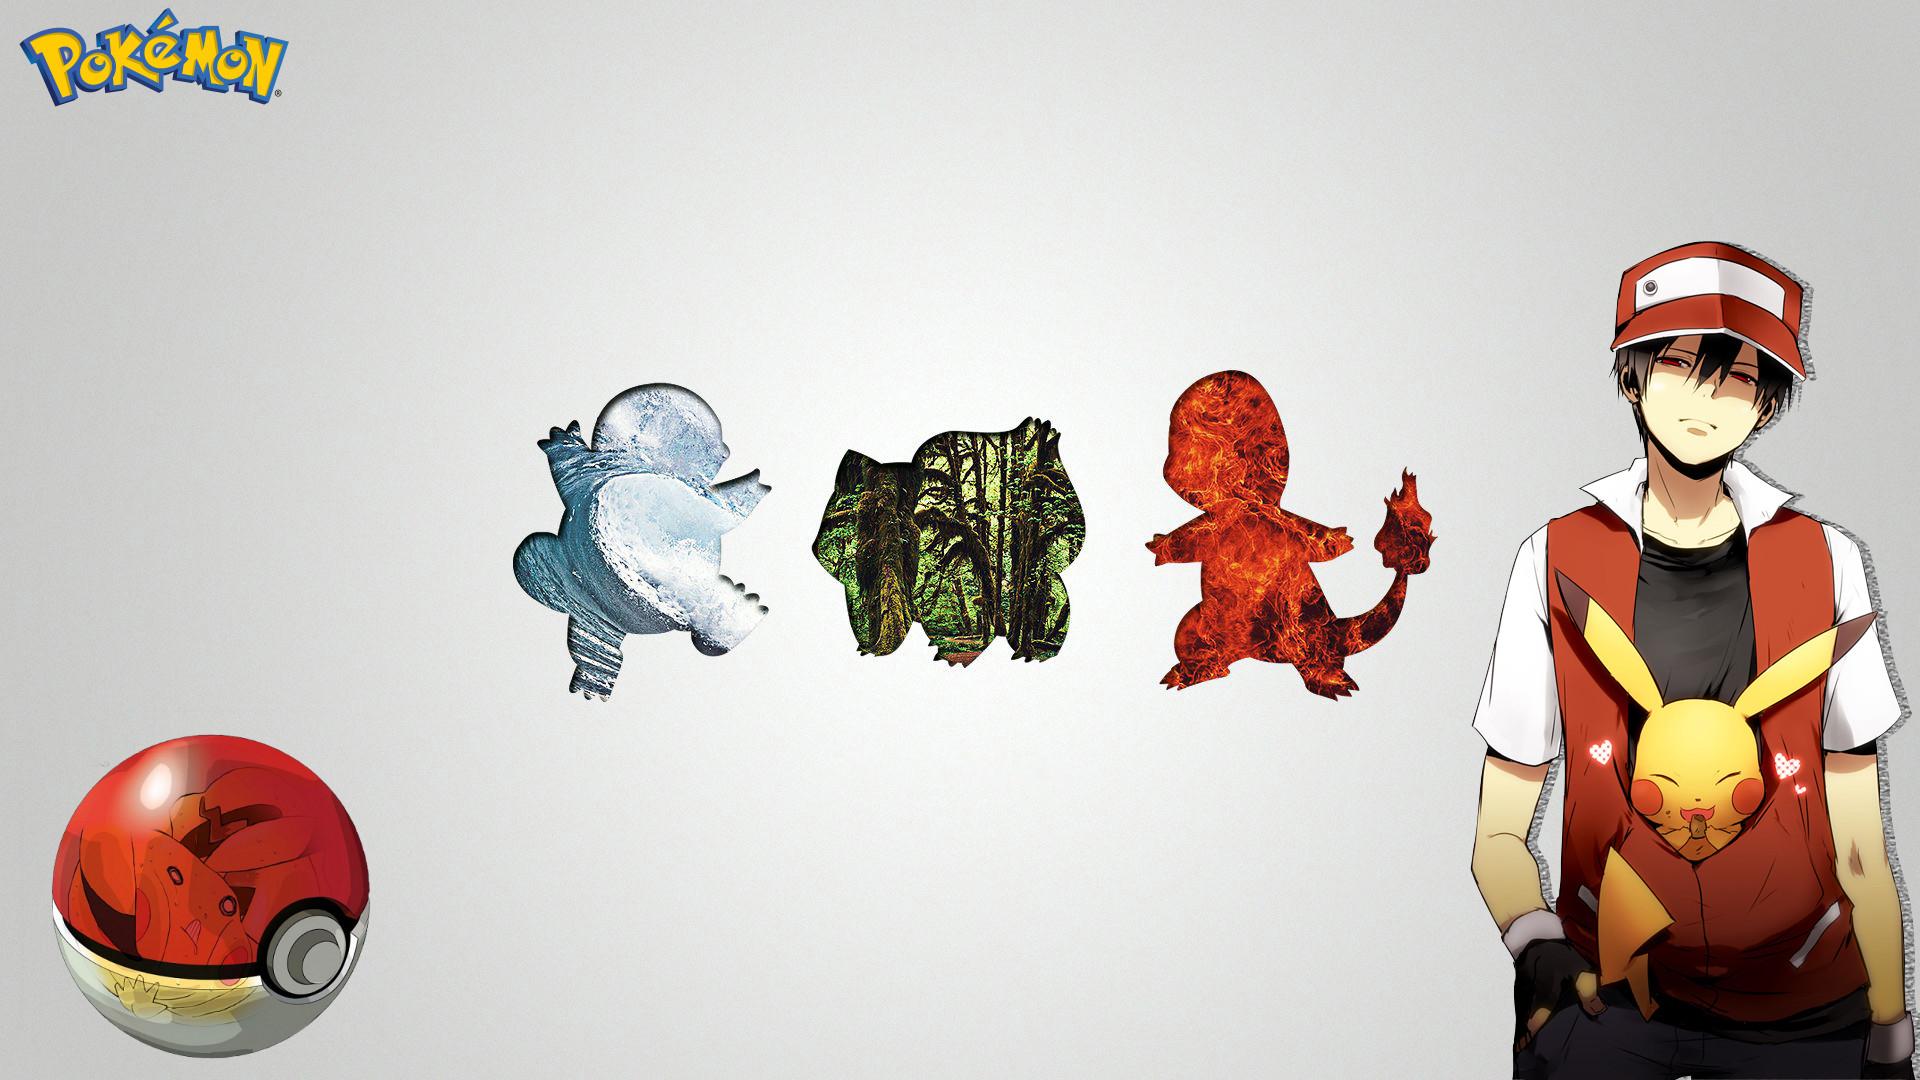 Anime РPok̩mon Ash (Pok̩mon) Pikachu Pokeball Squirtle (Pok̩mon)  Charmander (Pok̩mon